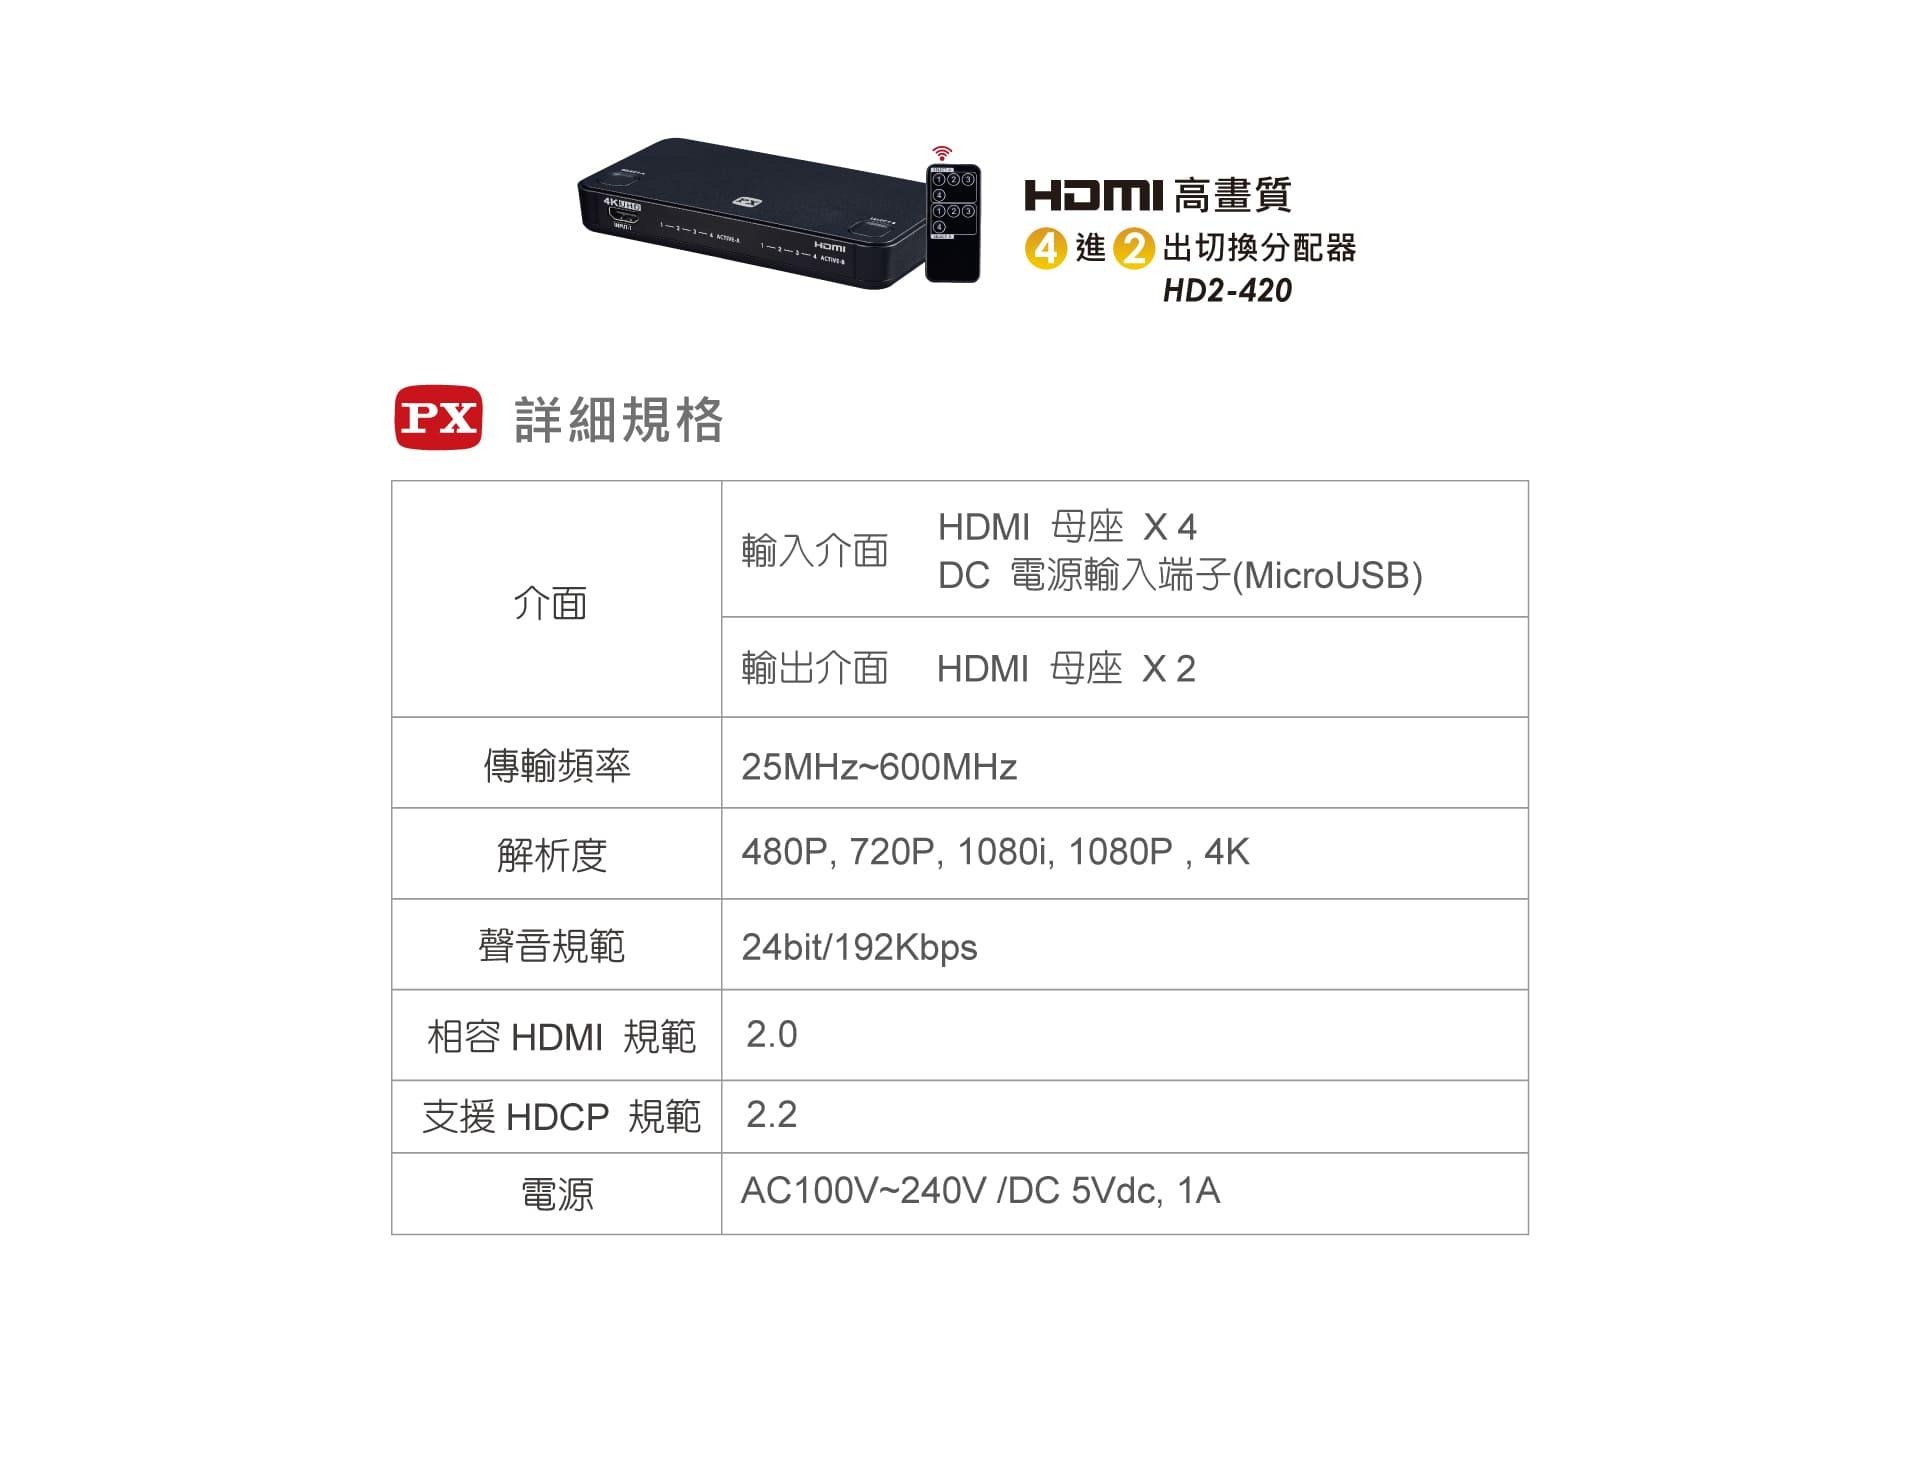 proimages/product/HDMI/HD2-420/HD2-420_08.jpg